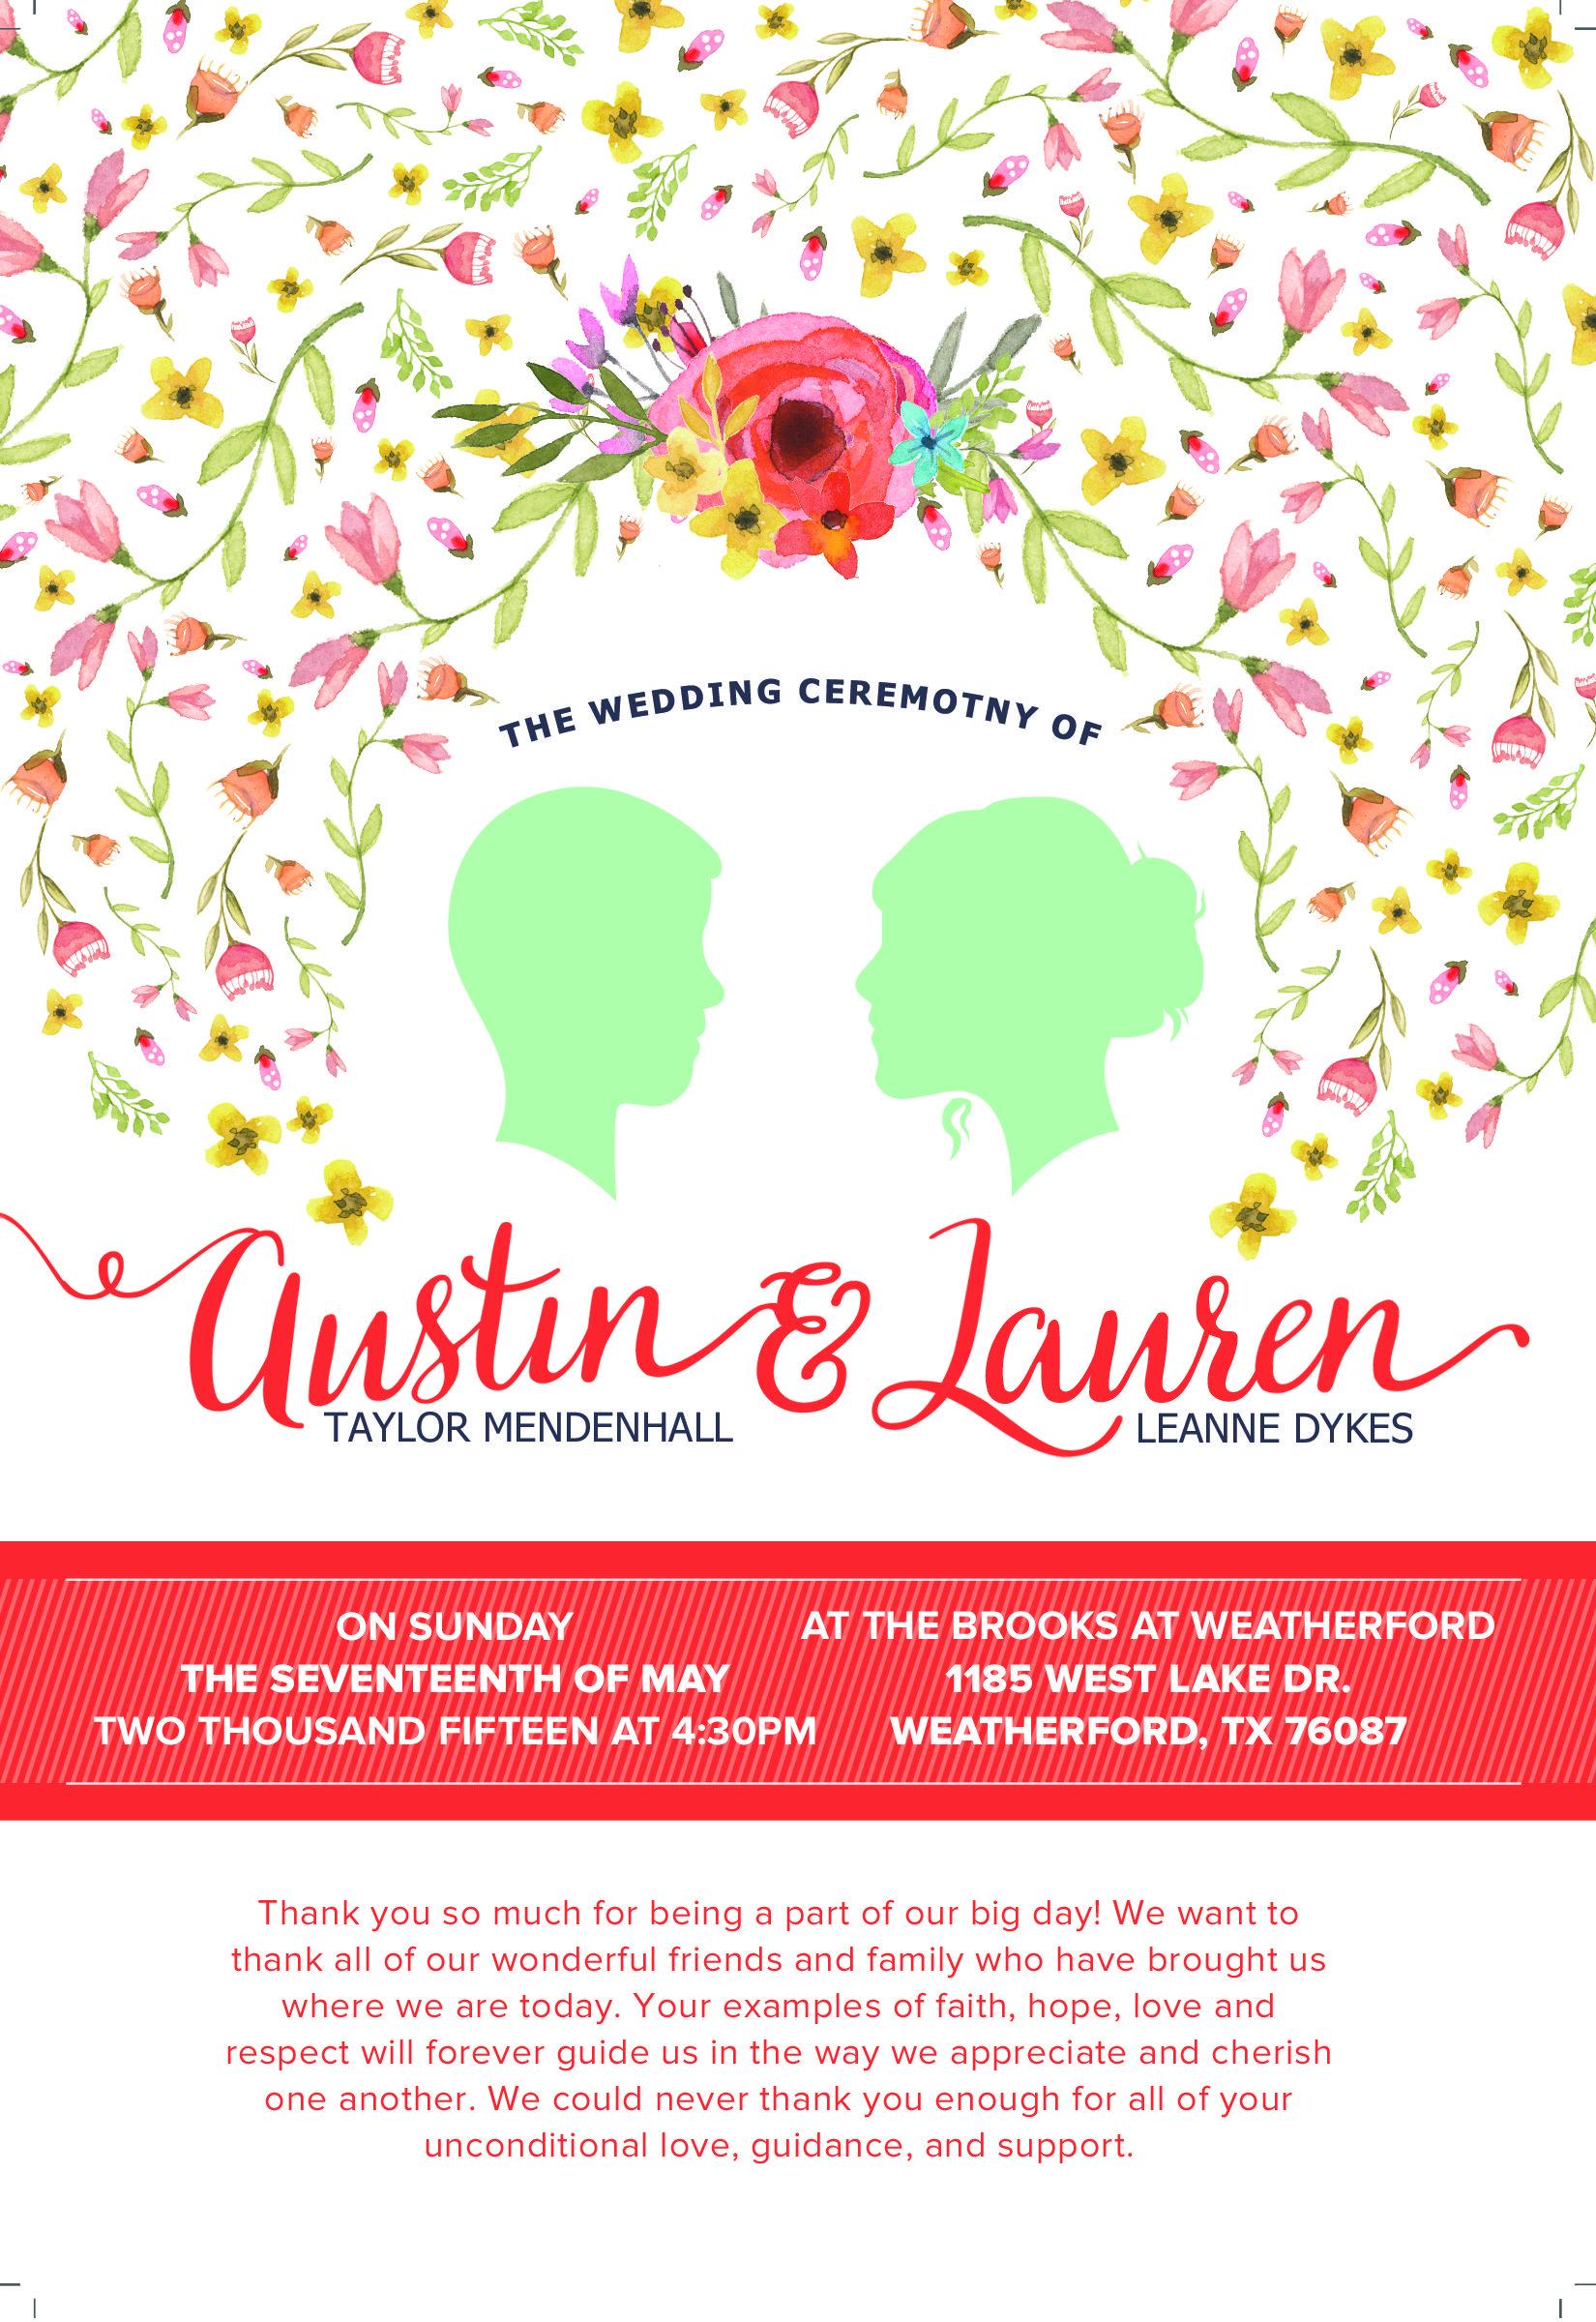 Wedding Program Design - Jane Austin style  #graphicdesign #design #wedding #invitation #program #janeaustin